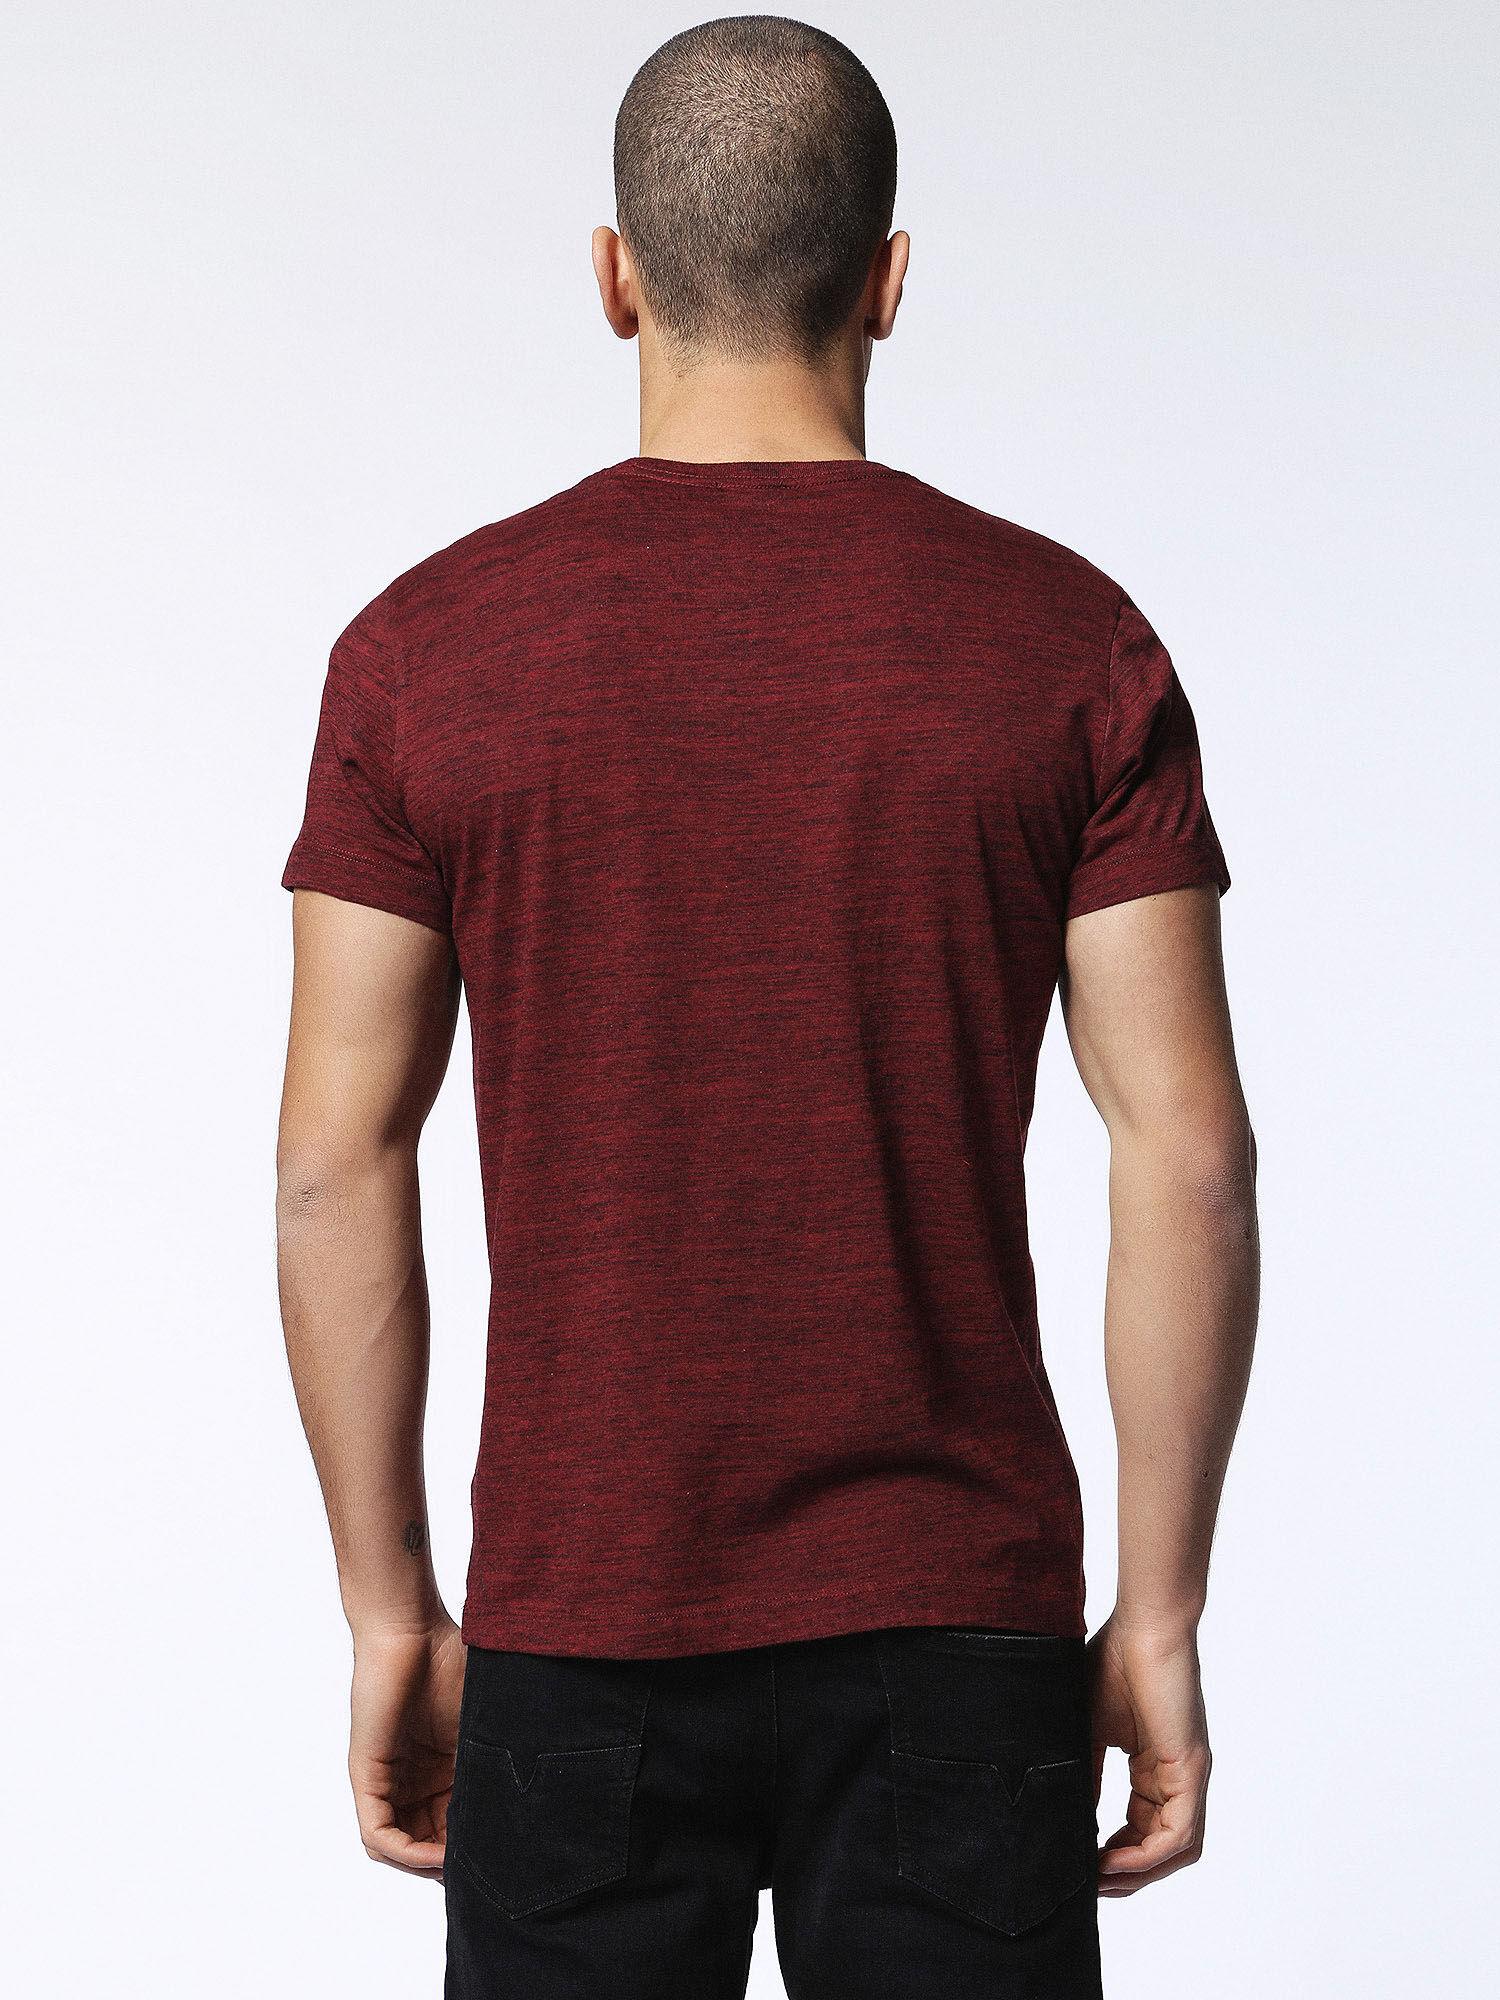 00SN1L0GAOB T-Shirts Man T-SIRIO by Diesel Burgundy